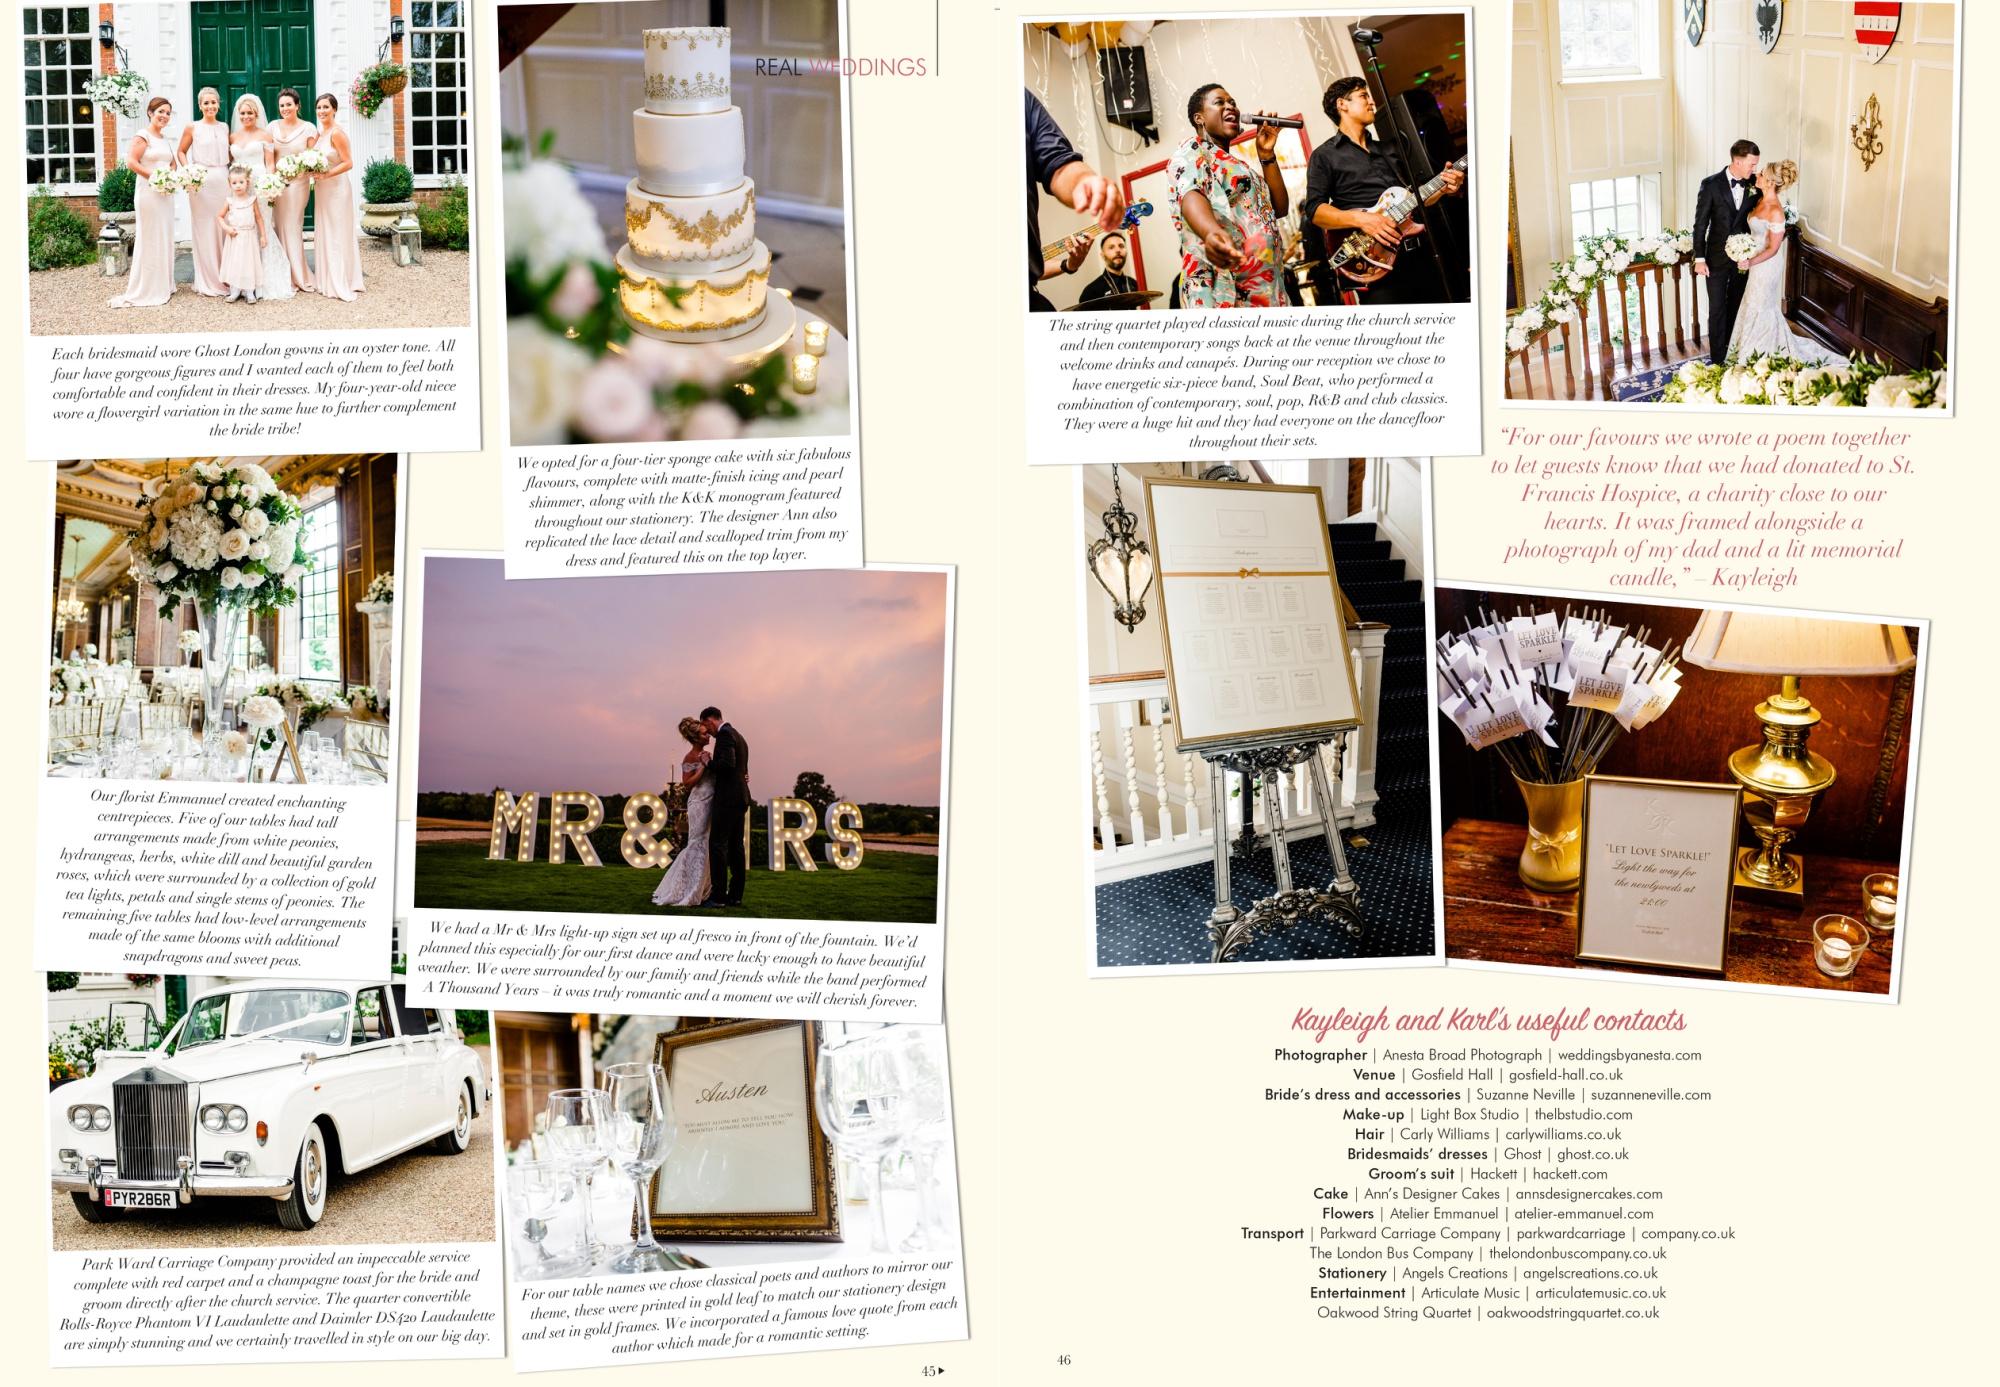 AEW84-Gosfield Hall Wedding Photographer 2.jpg